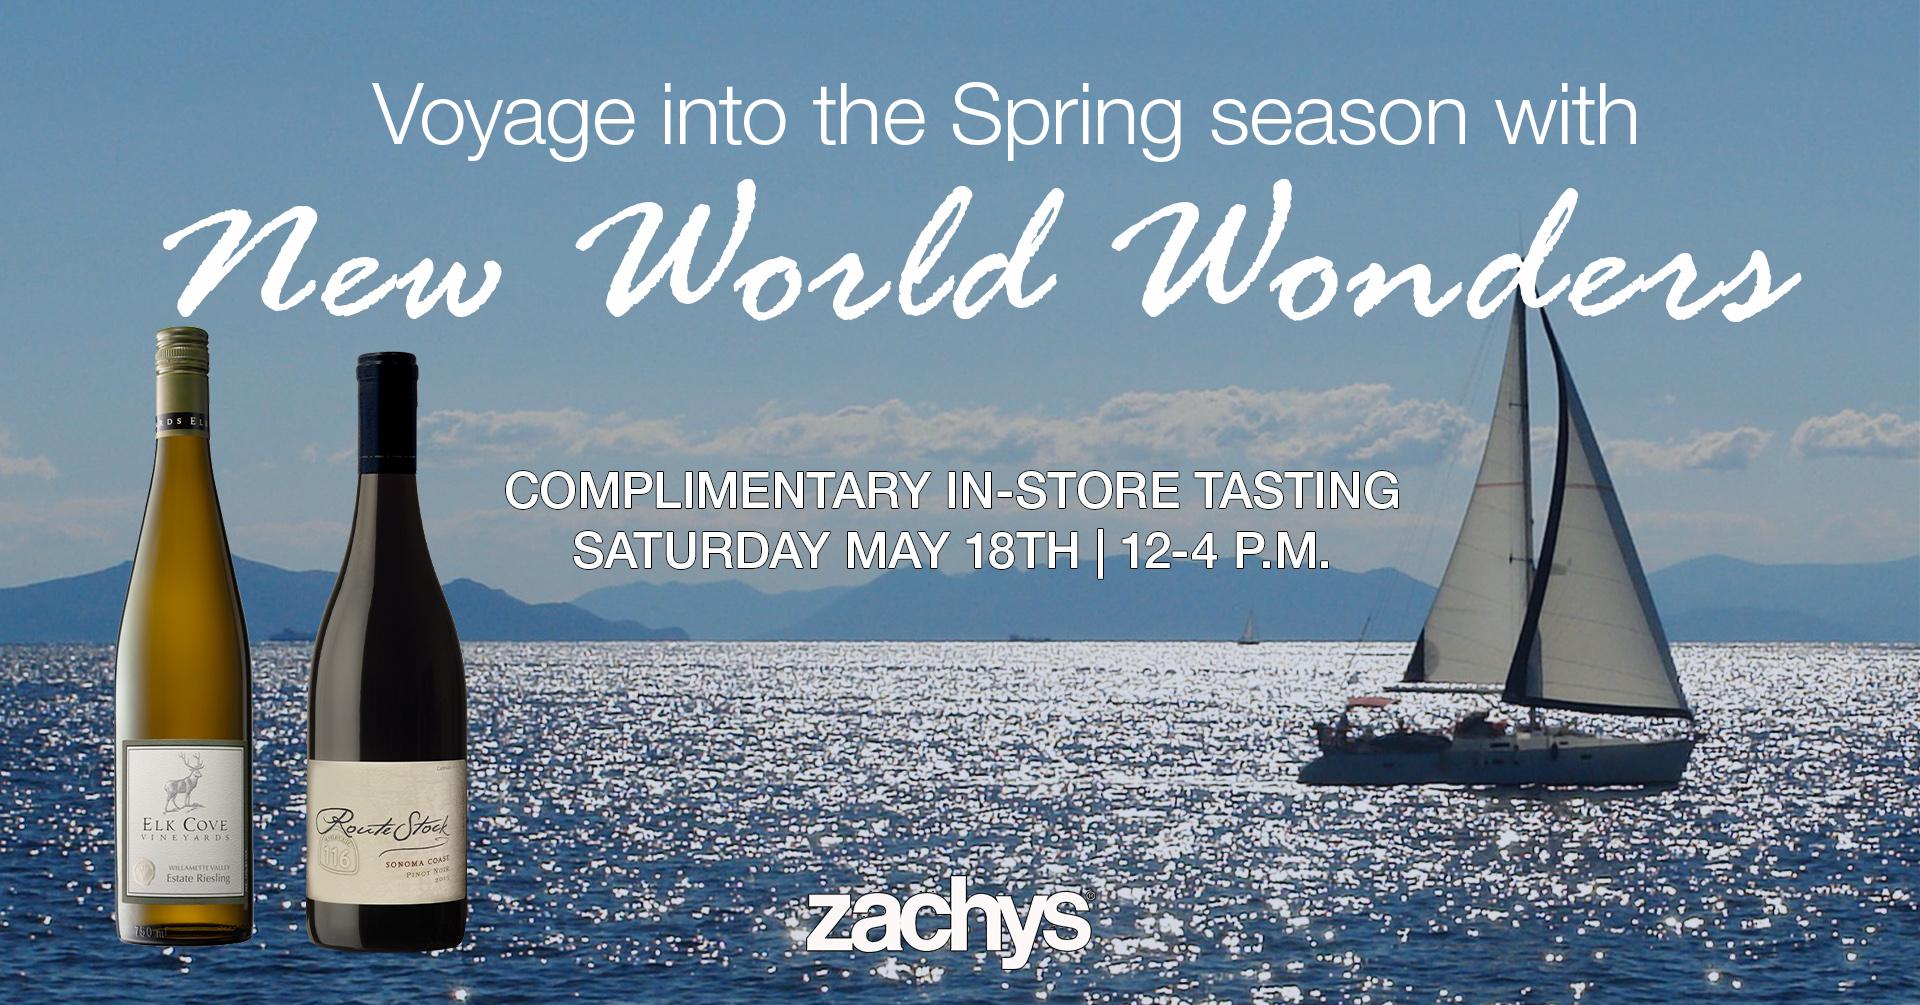 new world wonders tasting event banner, nautical theme